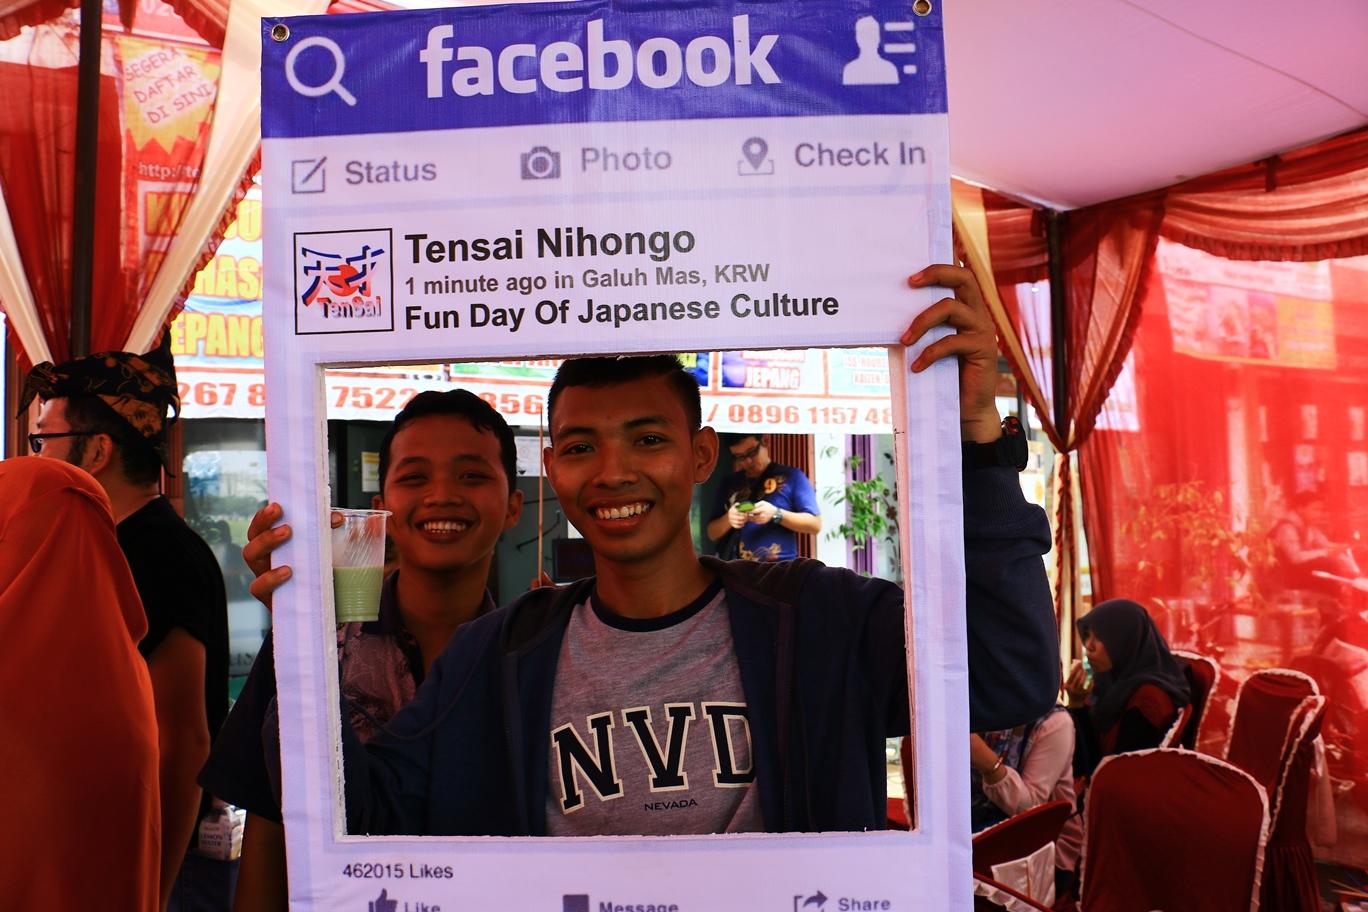 Bea siswa ke Jepang